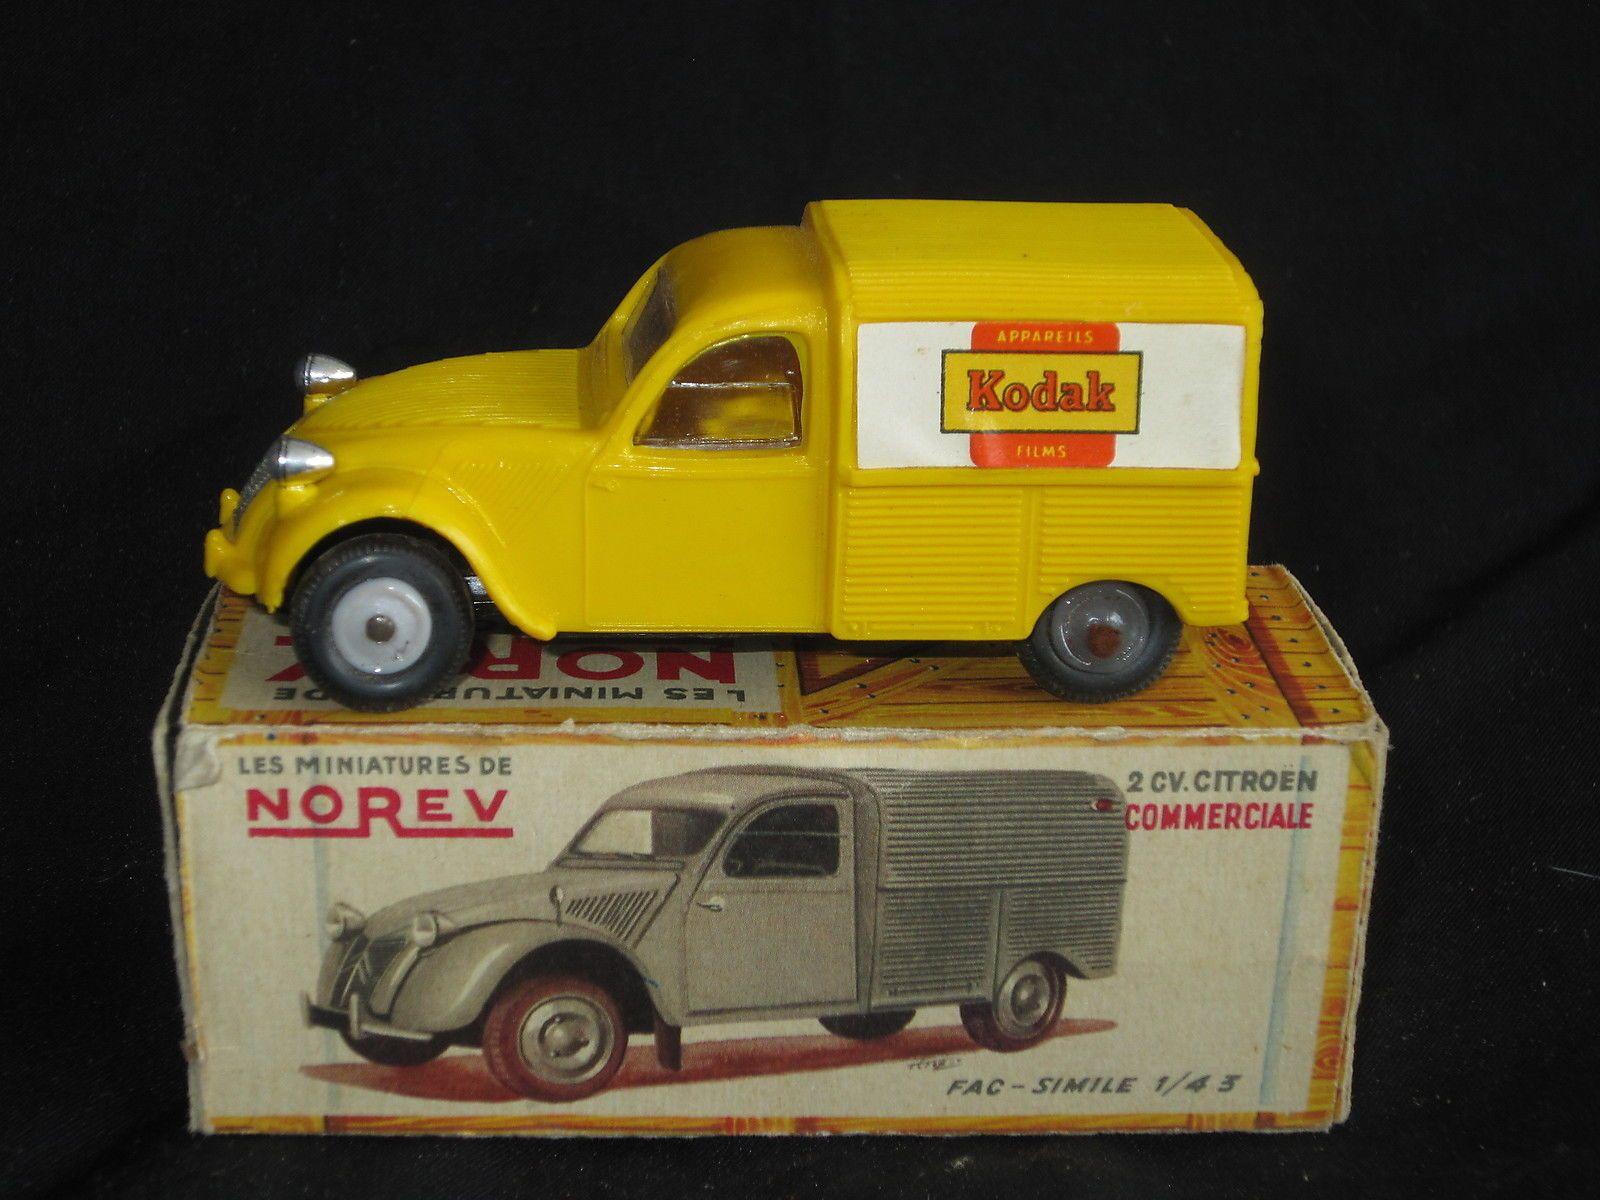 Norev 2cv Commerciale Kodak 2cv Citroen 2cv Jouet